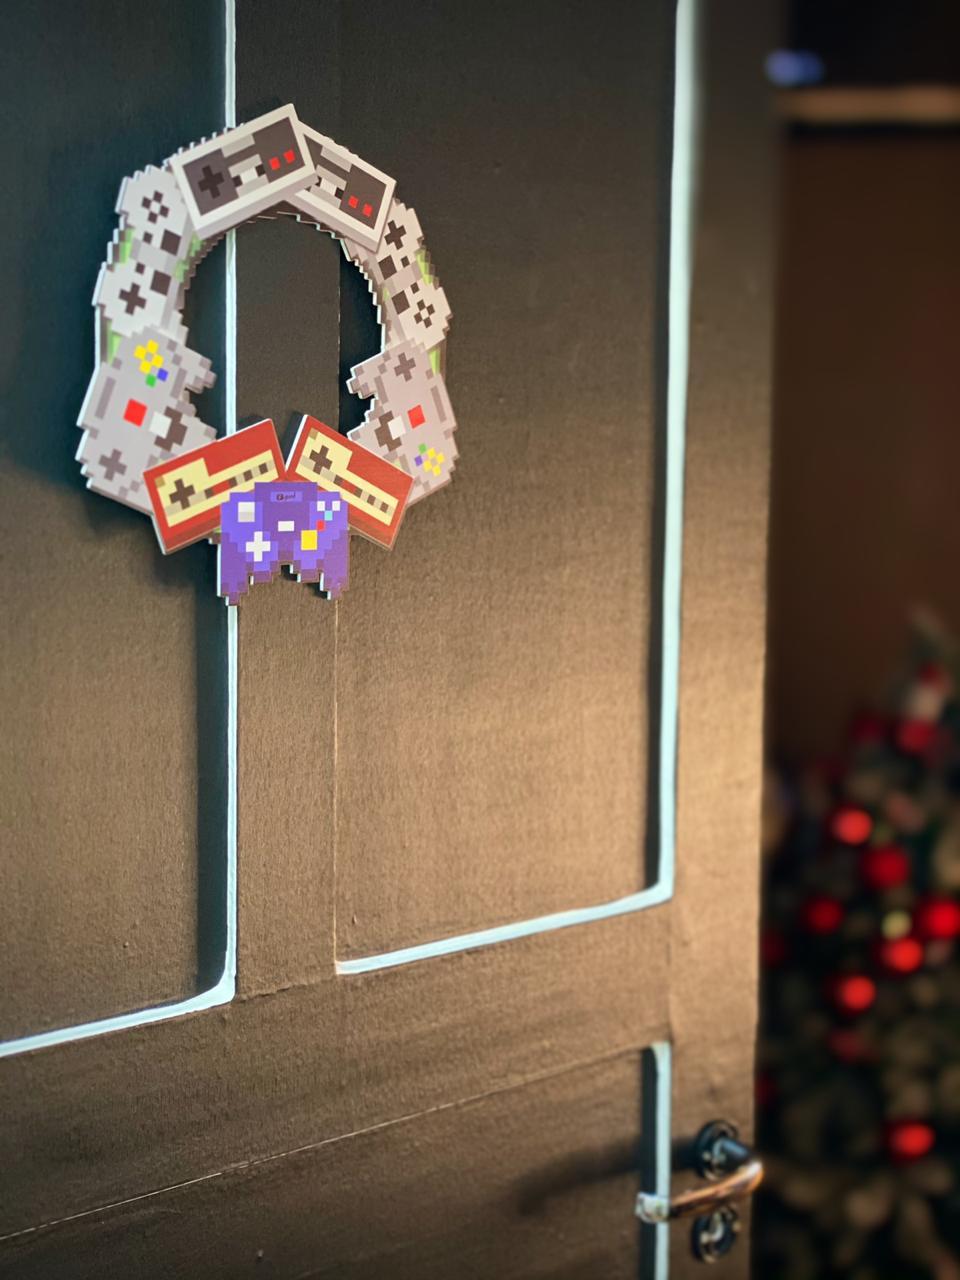 Enfeite Árvore de Natal Geek Controles Retro